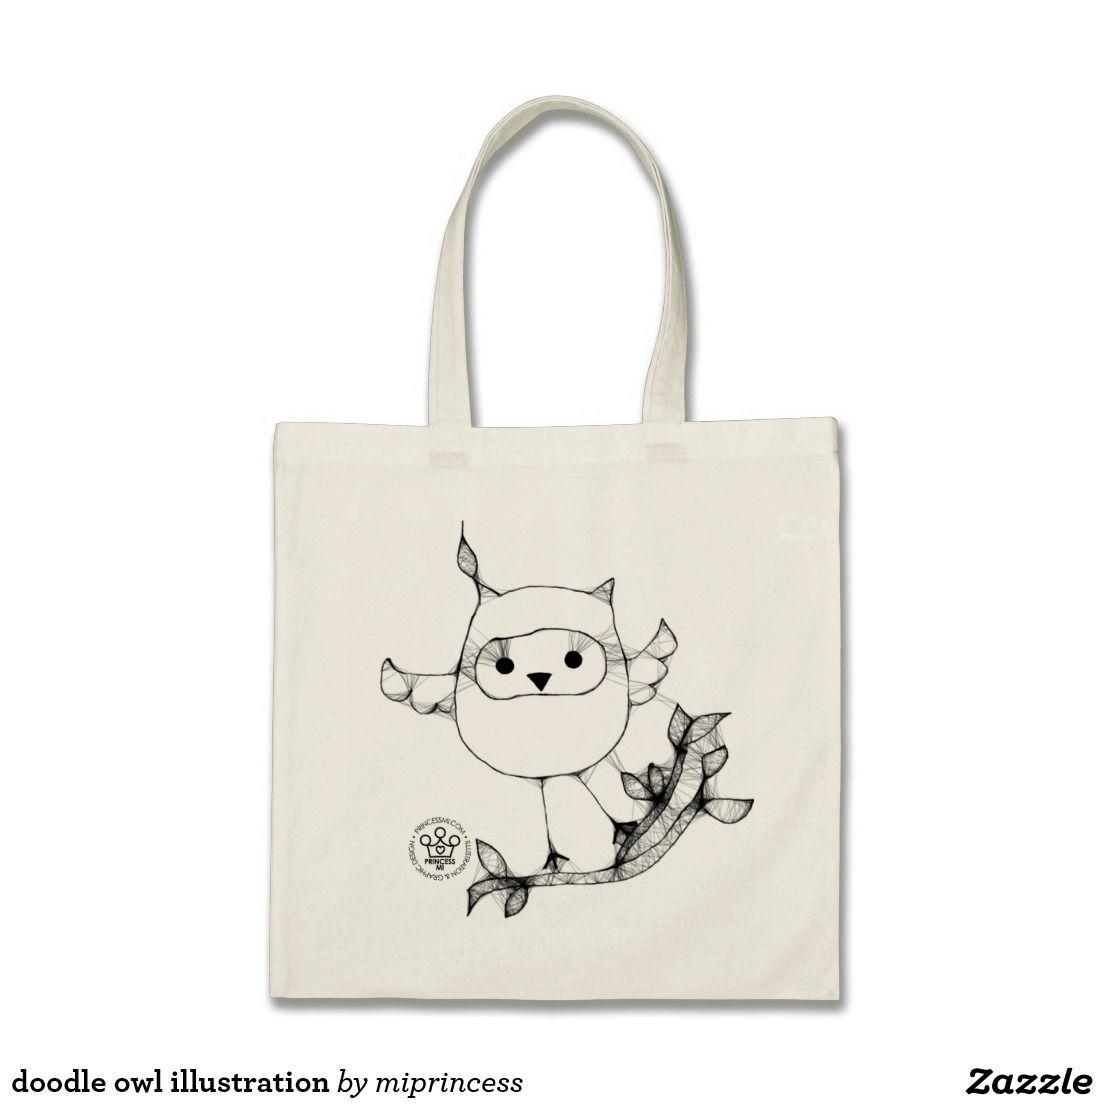 doodle owl illustration   zazzle design   Pinterest   Owl illustration